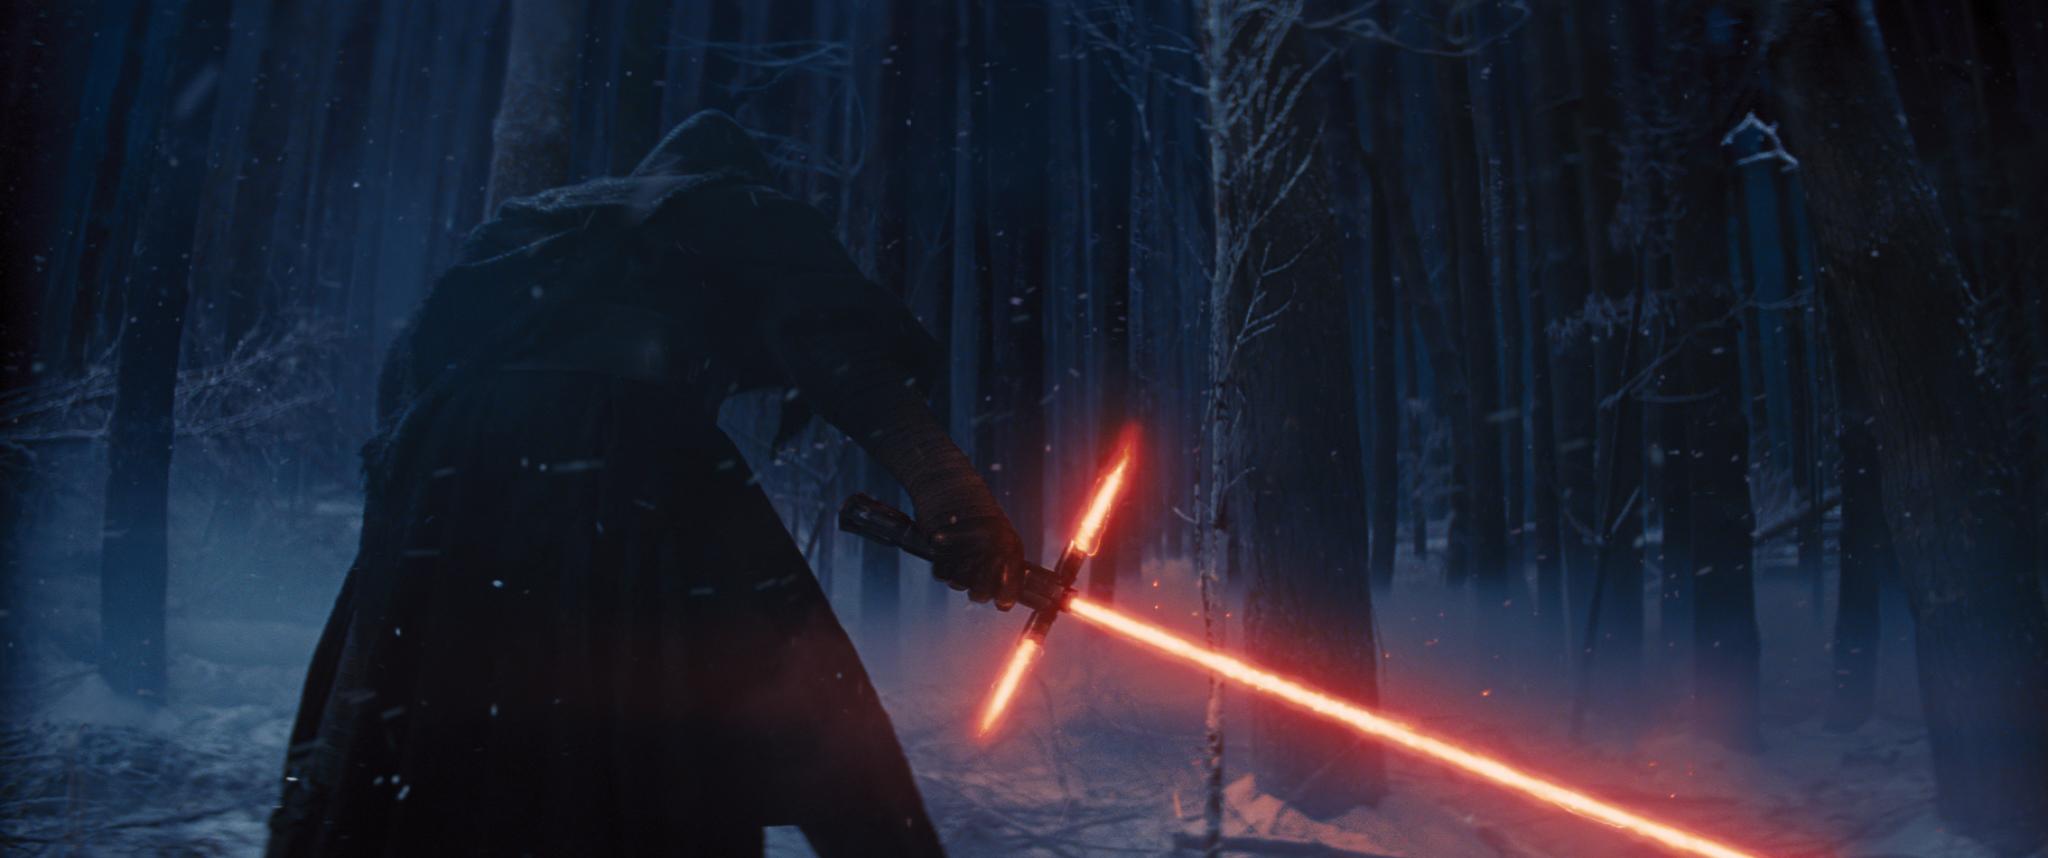 Kylo Ren Wookieepedia The Star Wars Wiki